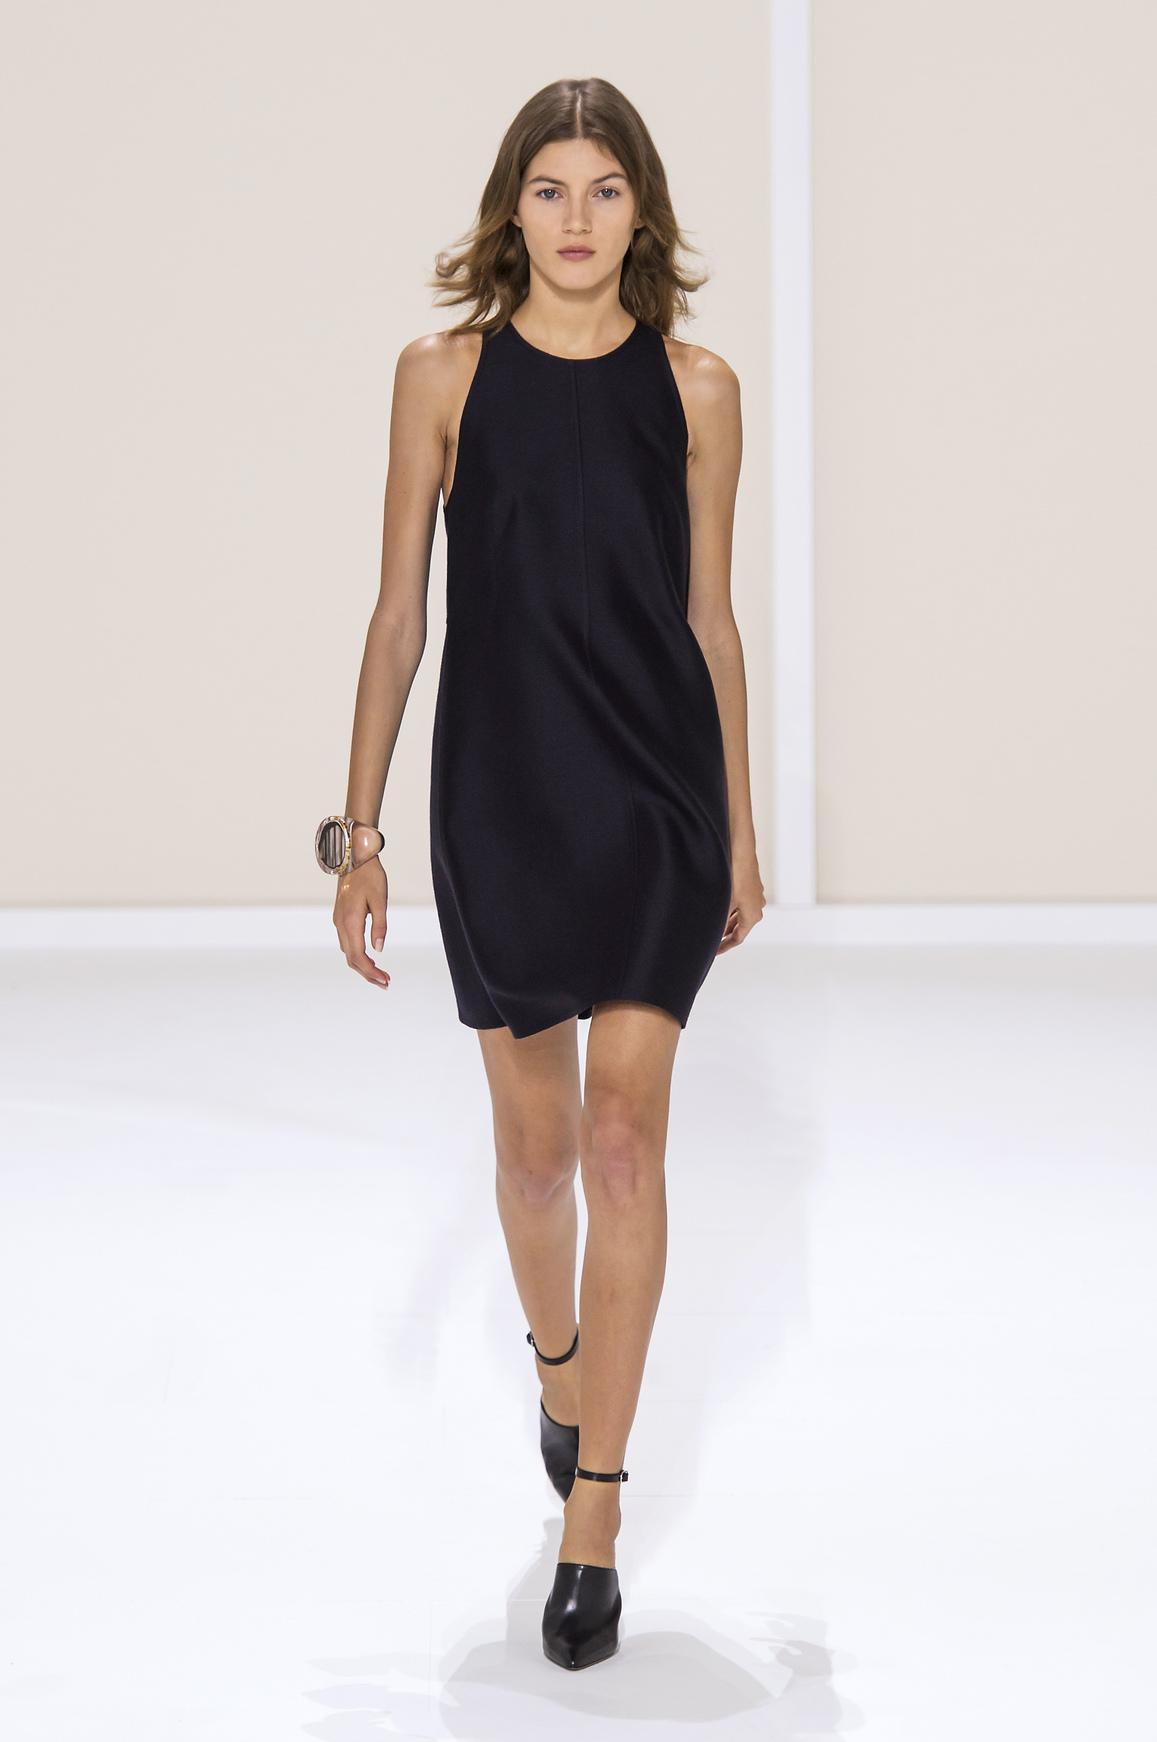 la petite robe noire la pi ce mode de l t madame figaro. Black Bedroom Furniture Sets. Home Design Ideas